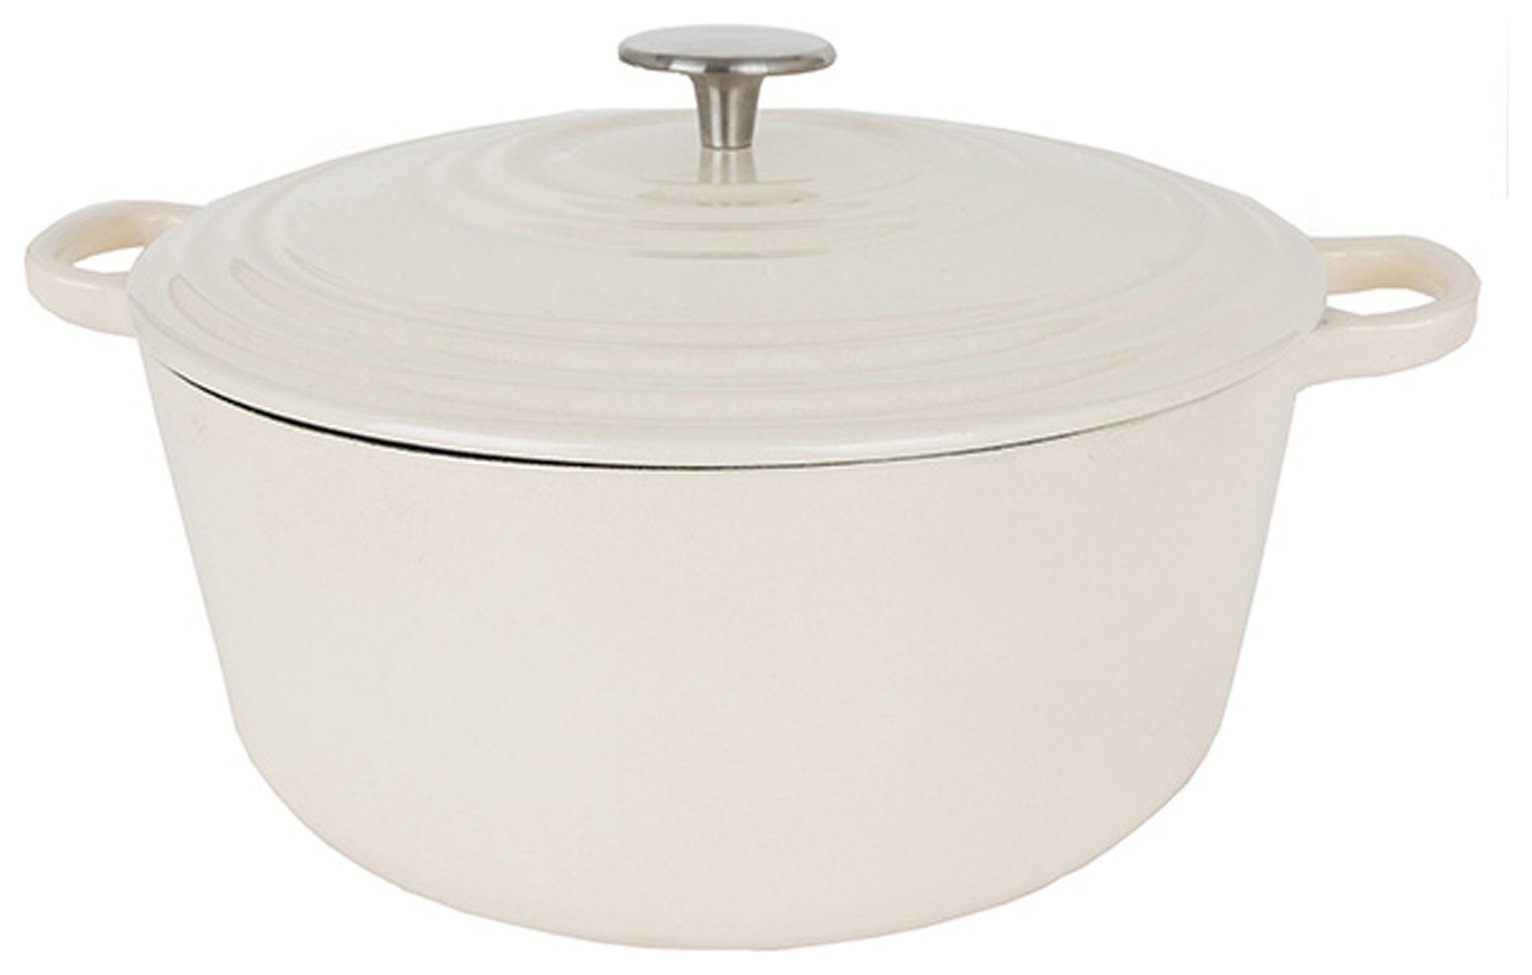 Sainsbury's Home 2.4 Litre Cast Iron Casserole Dish - Cream